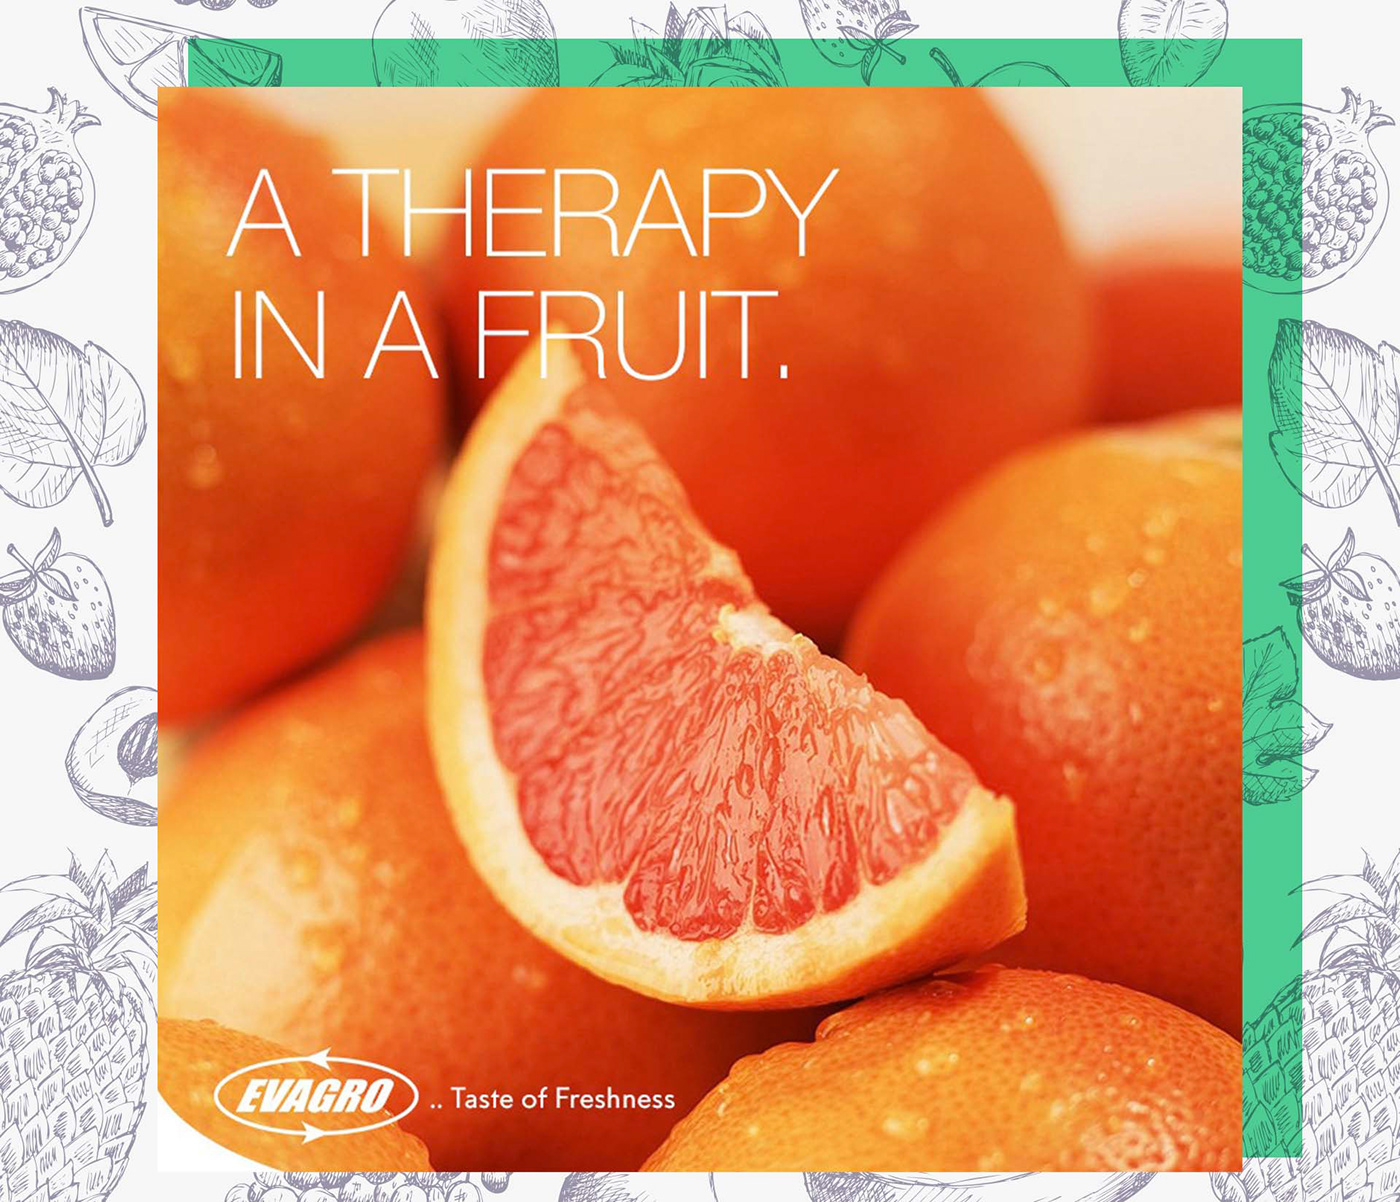 Image may contain: orange, grapefruit and lemon